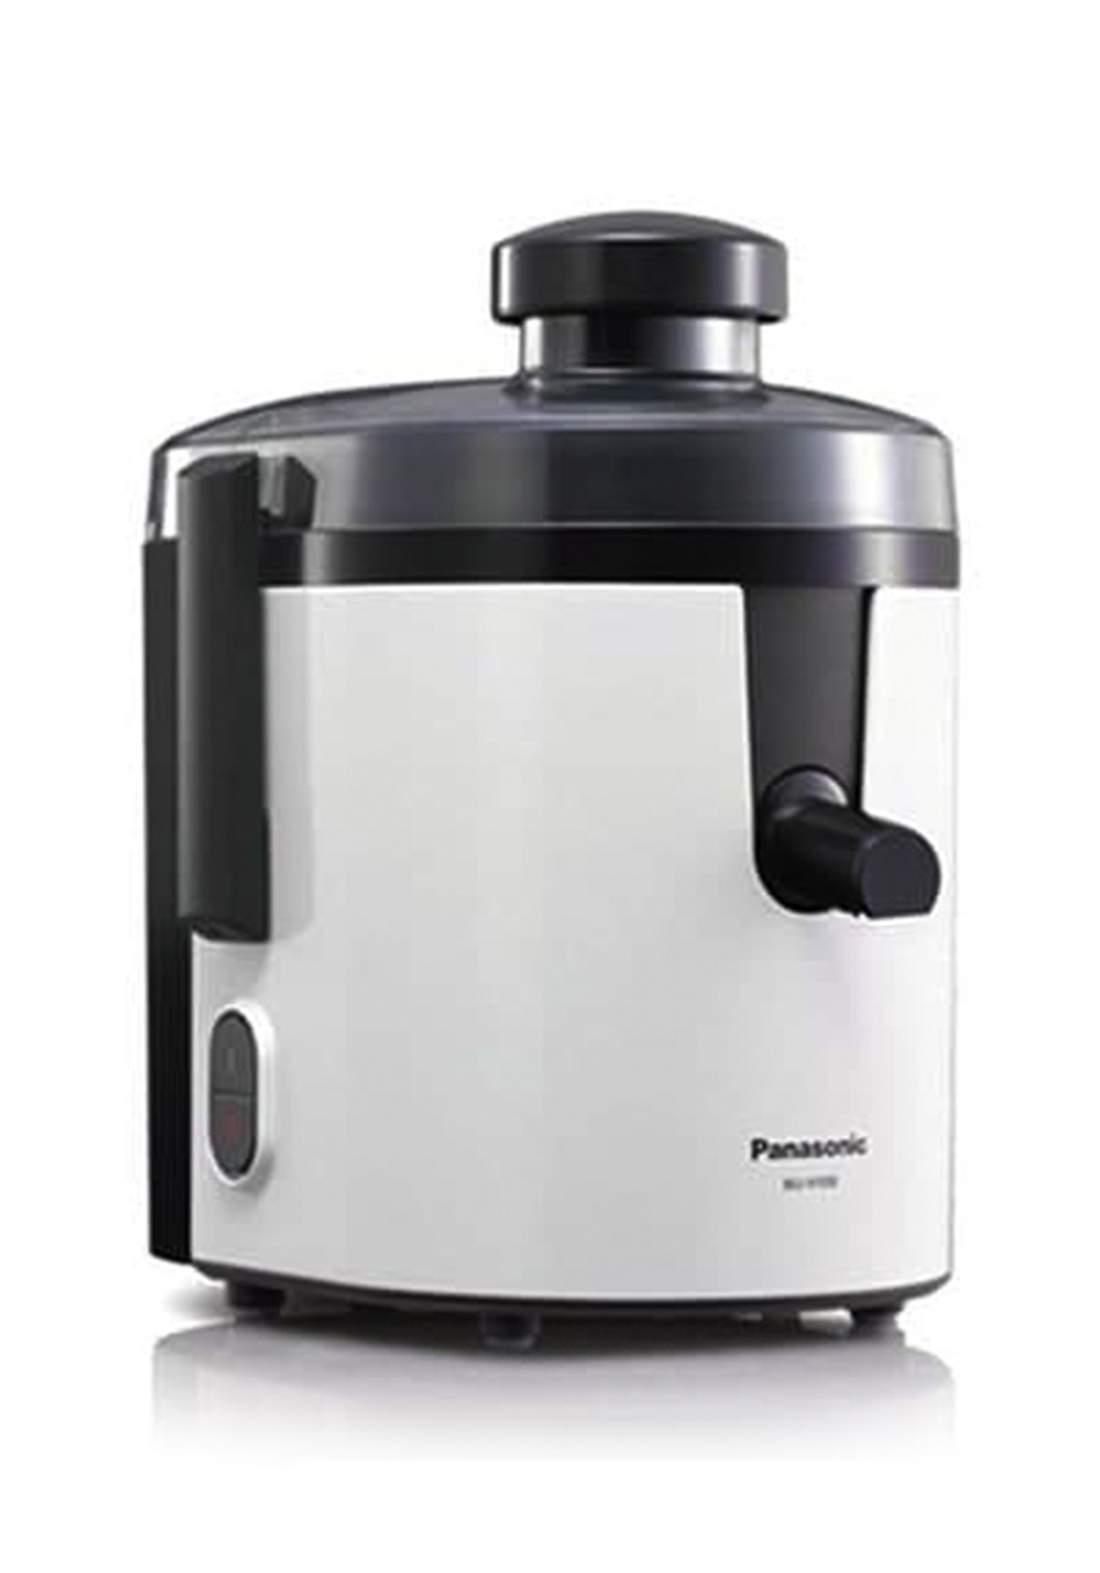 Panasonic-MJ-H100 WTJ Juicer 400W  خلاط الكهربائي